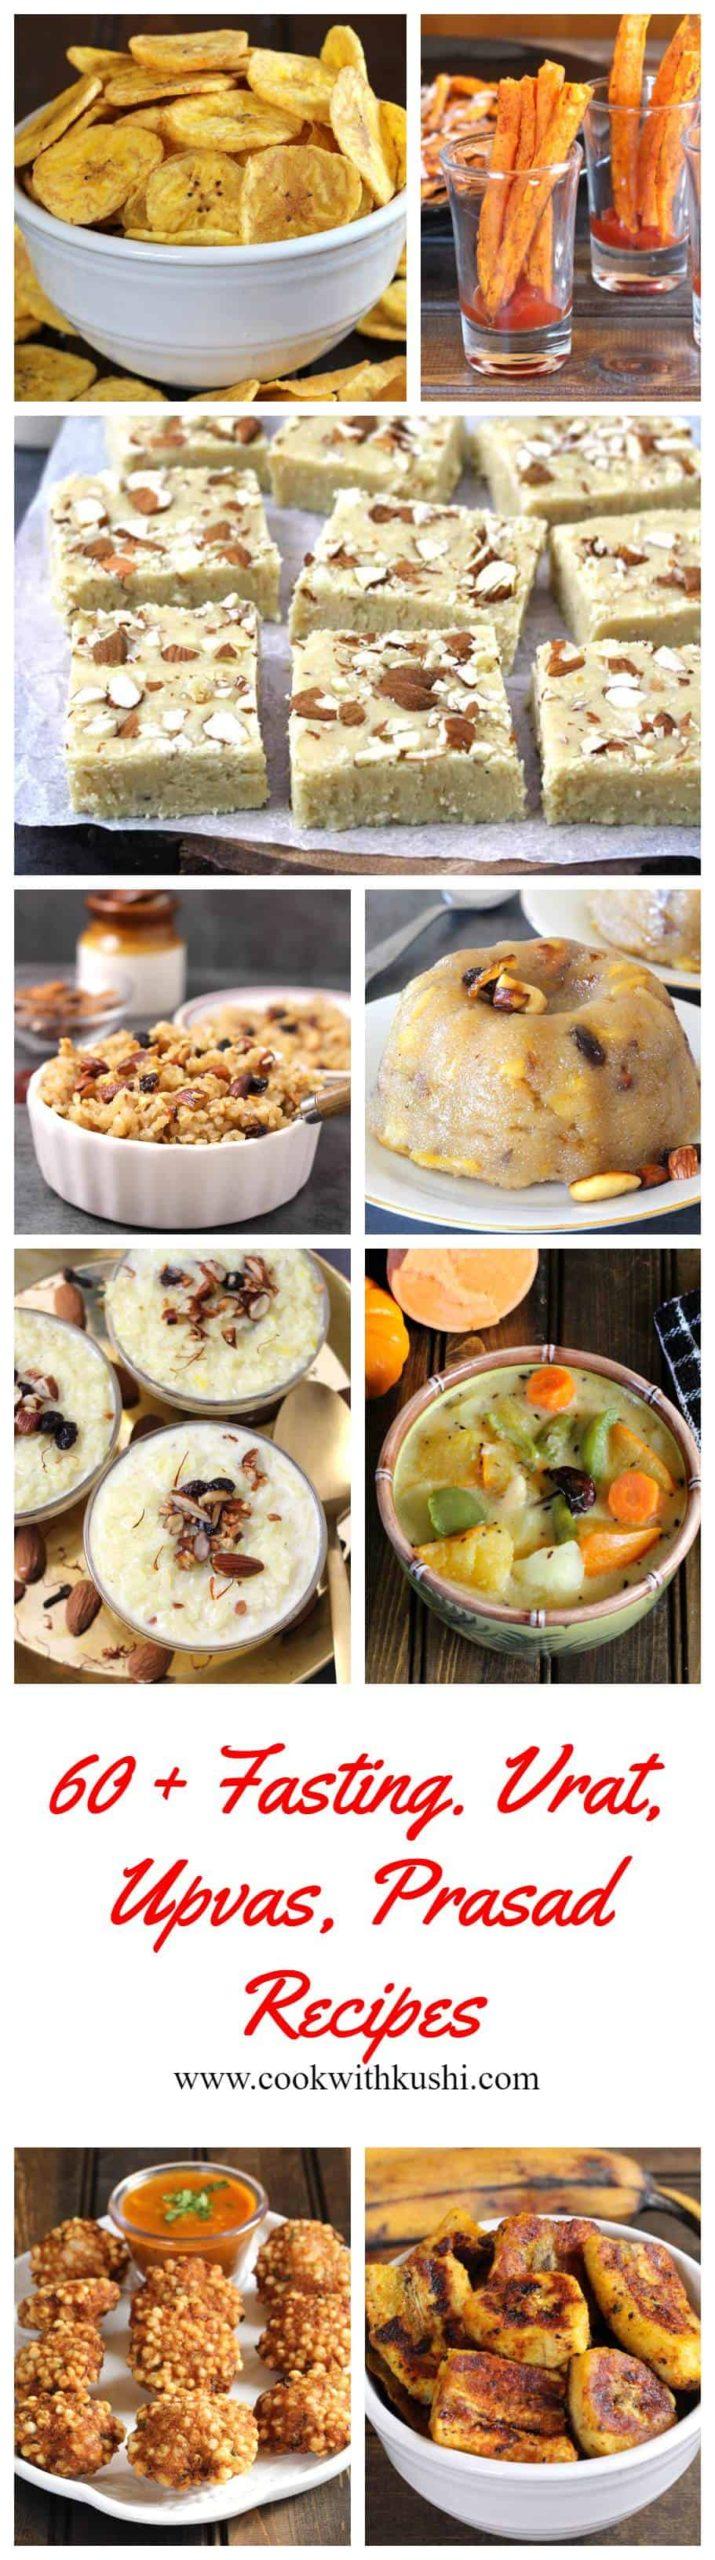 vrat or fasting recipes, upvas (upwas) recipes, prasad (prasadam recipes) that are made during Indian festivals like 9 days of Navratri, Janmashtami, Ganesh Chaturthi, Karwa chauth, Varalakshmi vratam (varamahalakshmi pooja), Shravan month, Diwali.